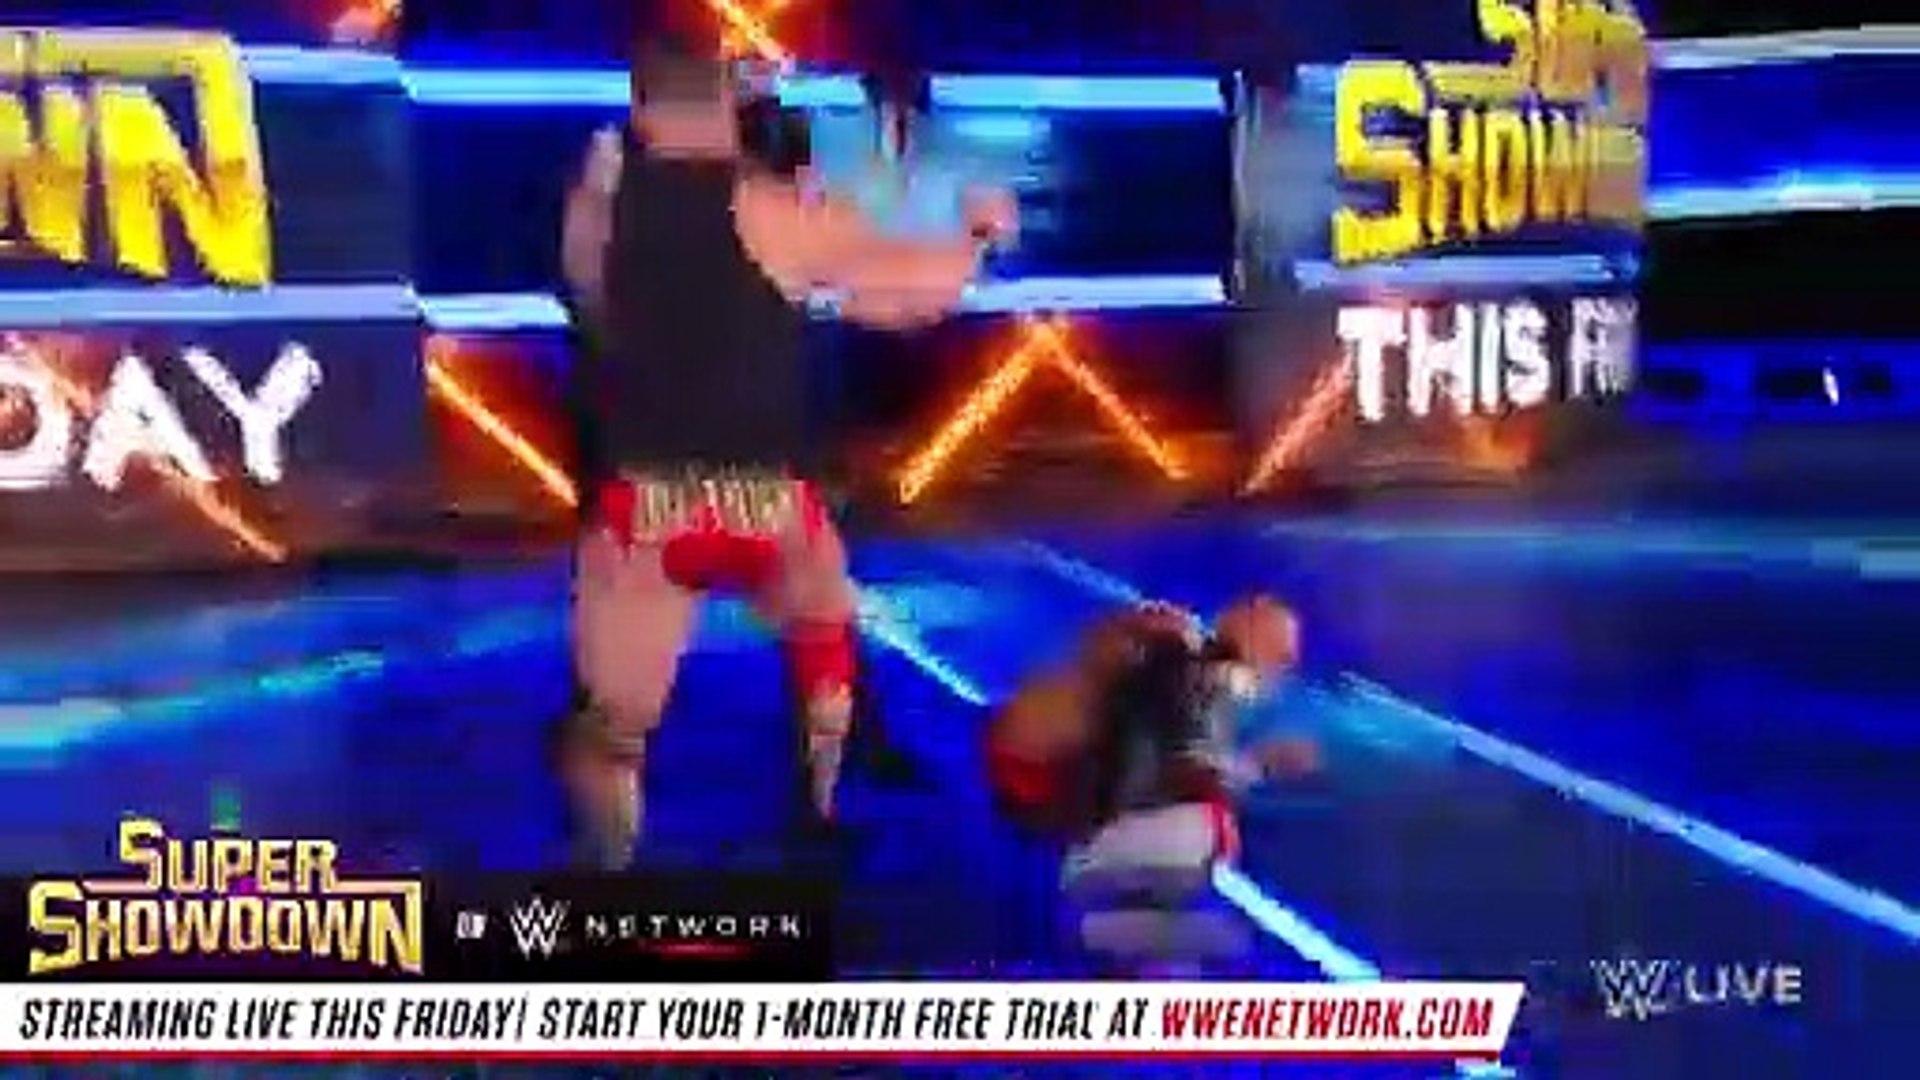 Shane-McMahon-leads-an-assault-on-Roman-Reigns-SmackDown-LIVE-June-4-2019